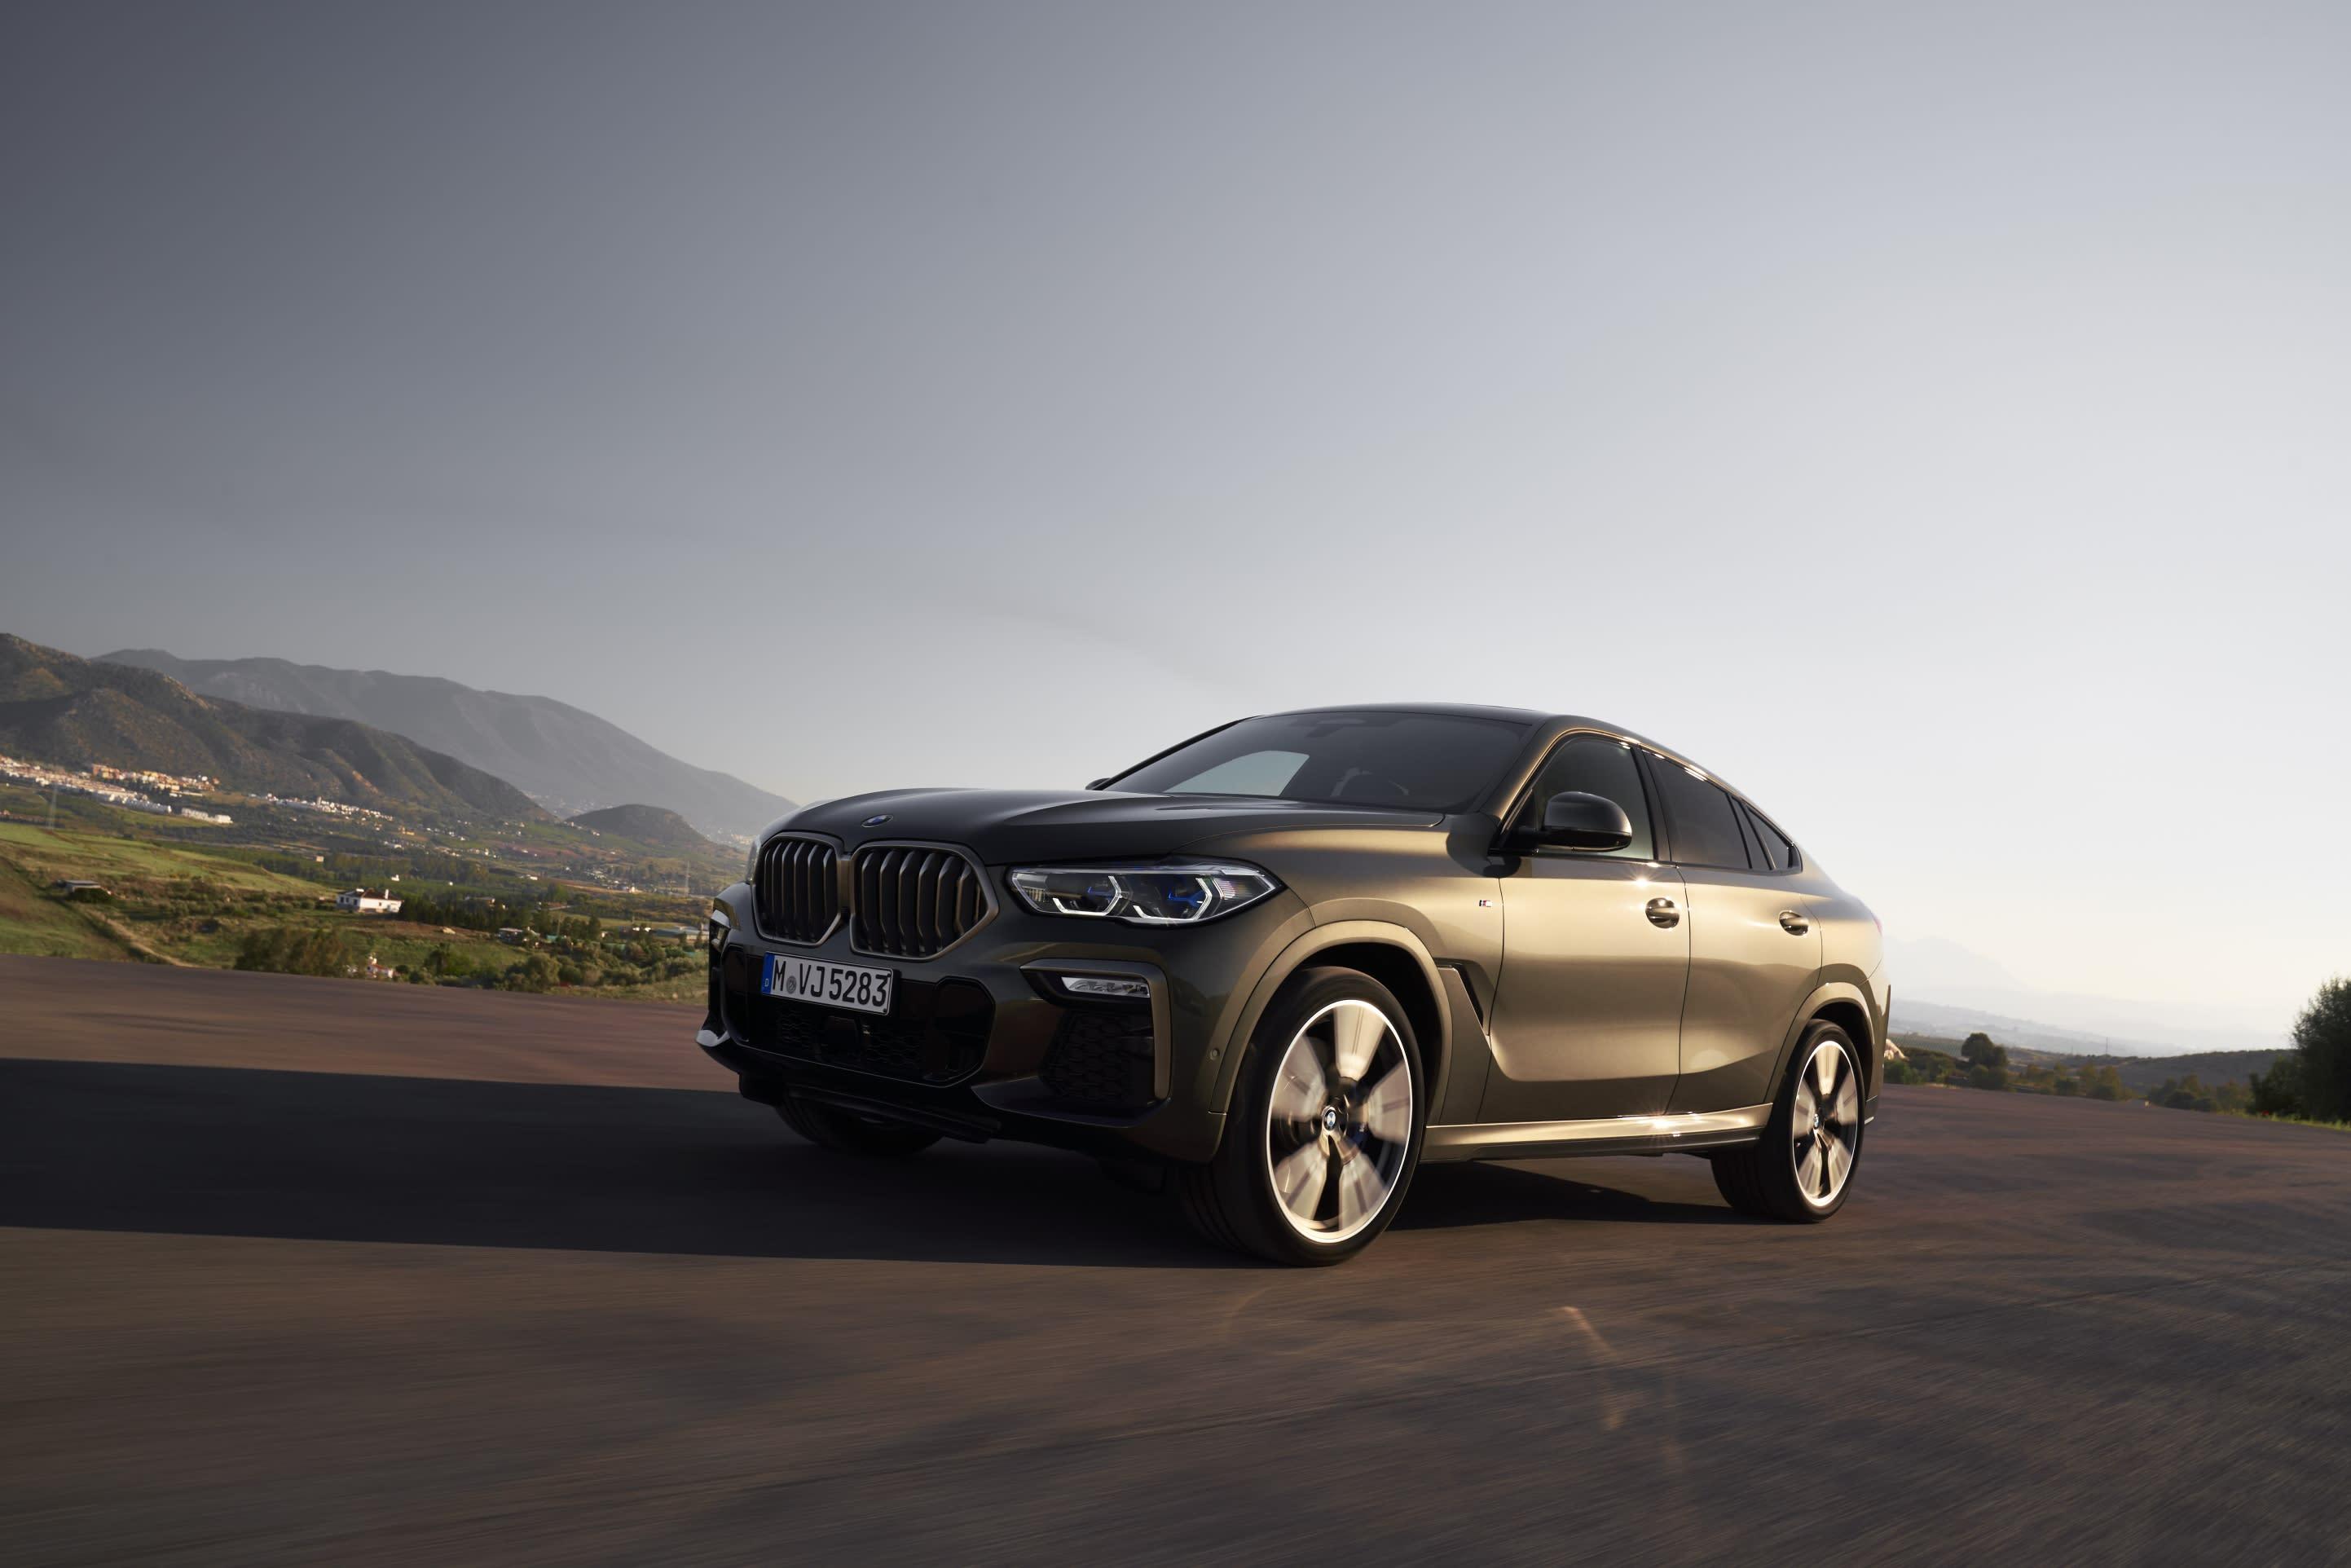 2021 BMW X6 M To Cost More Than $110k [Spy Photos] >> 2021 Bmw X6 M To Cost More Than 110k Spy Photos 2020 Upcoming